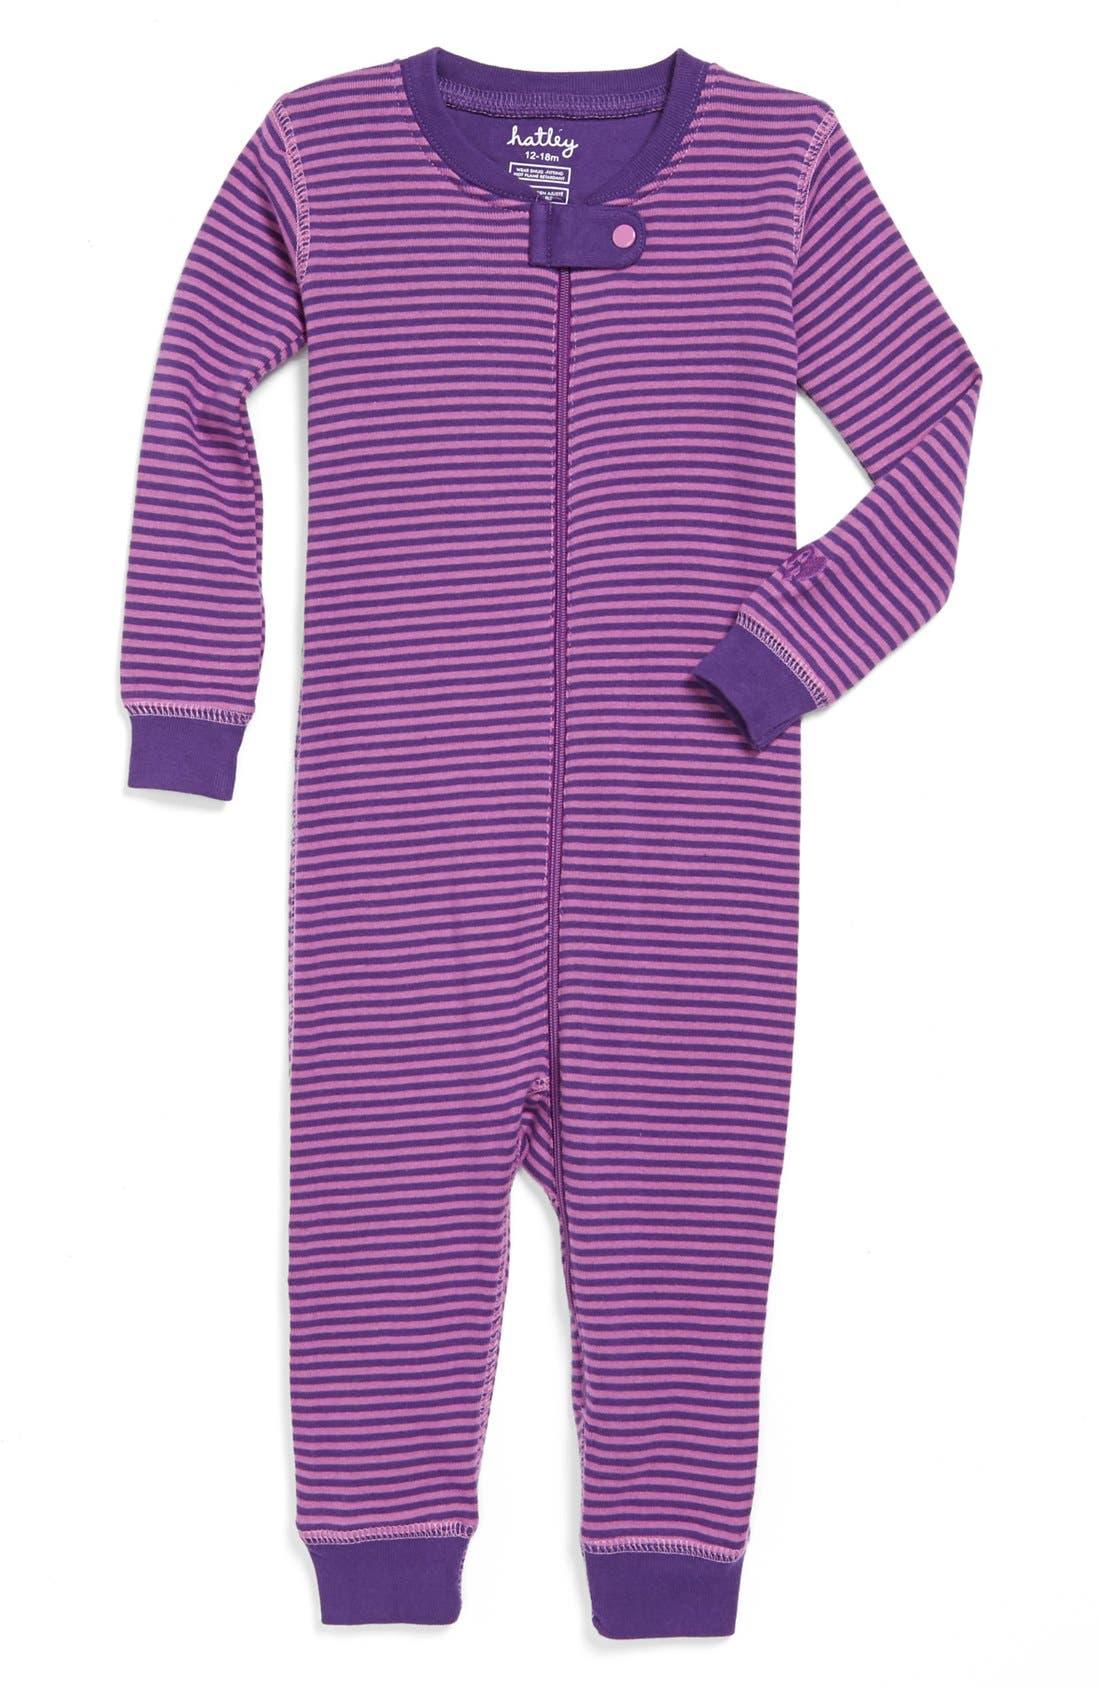 Alternate Image 1 Selected - Hatley Stripe Romper (Baby Girls)